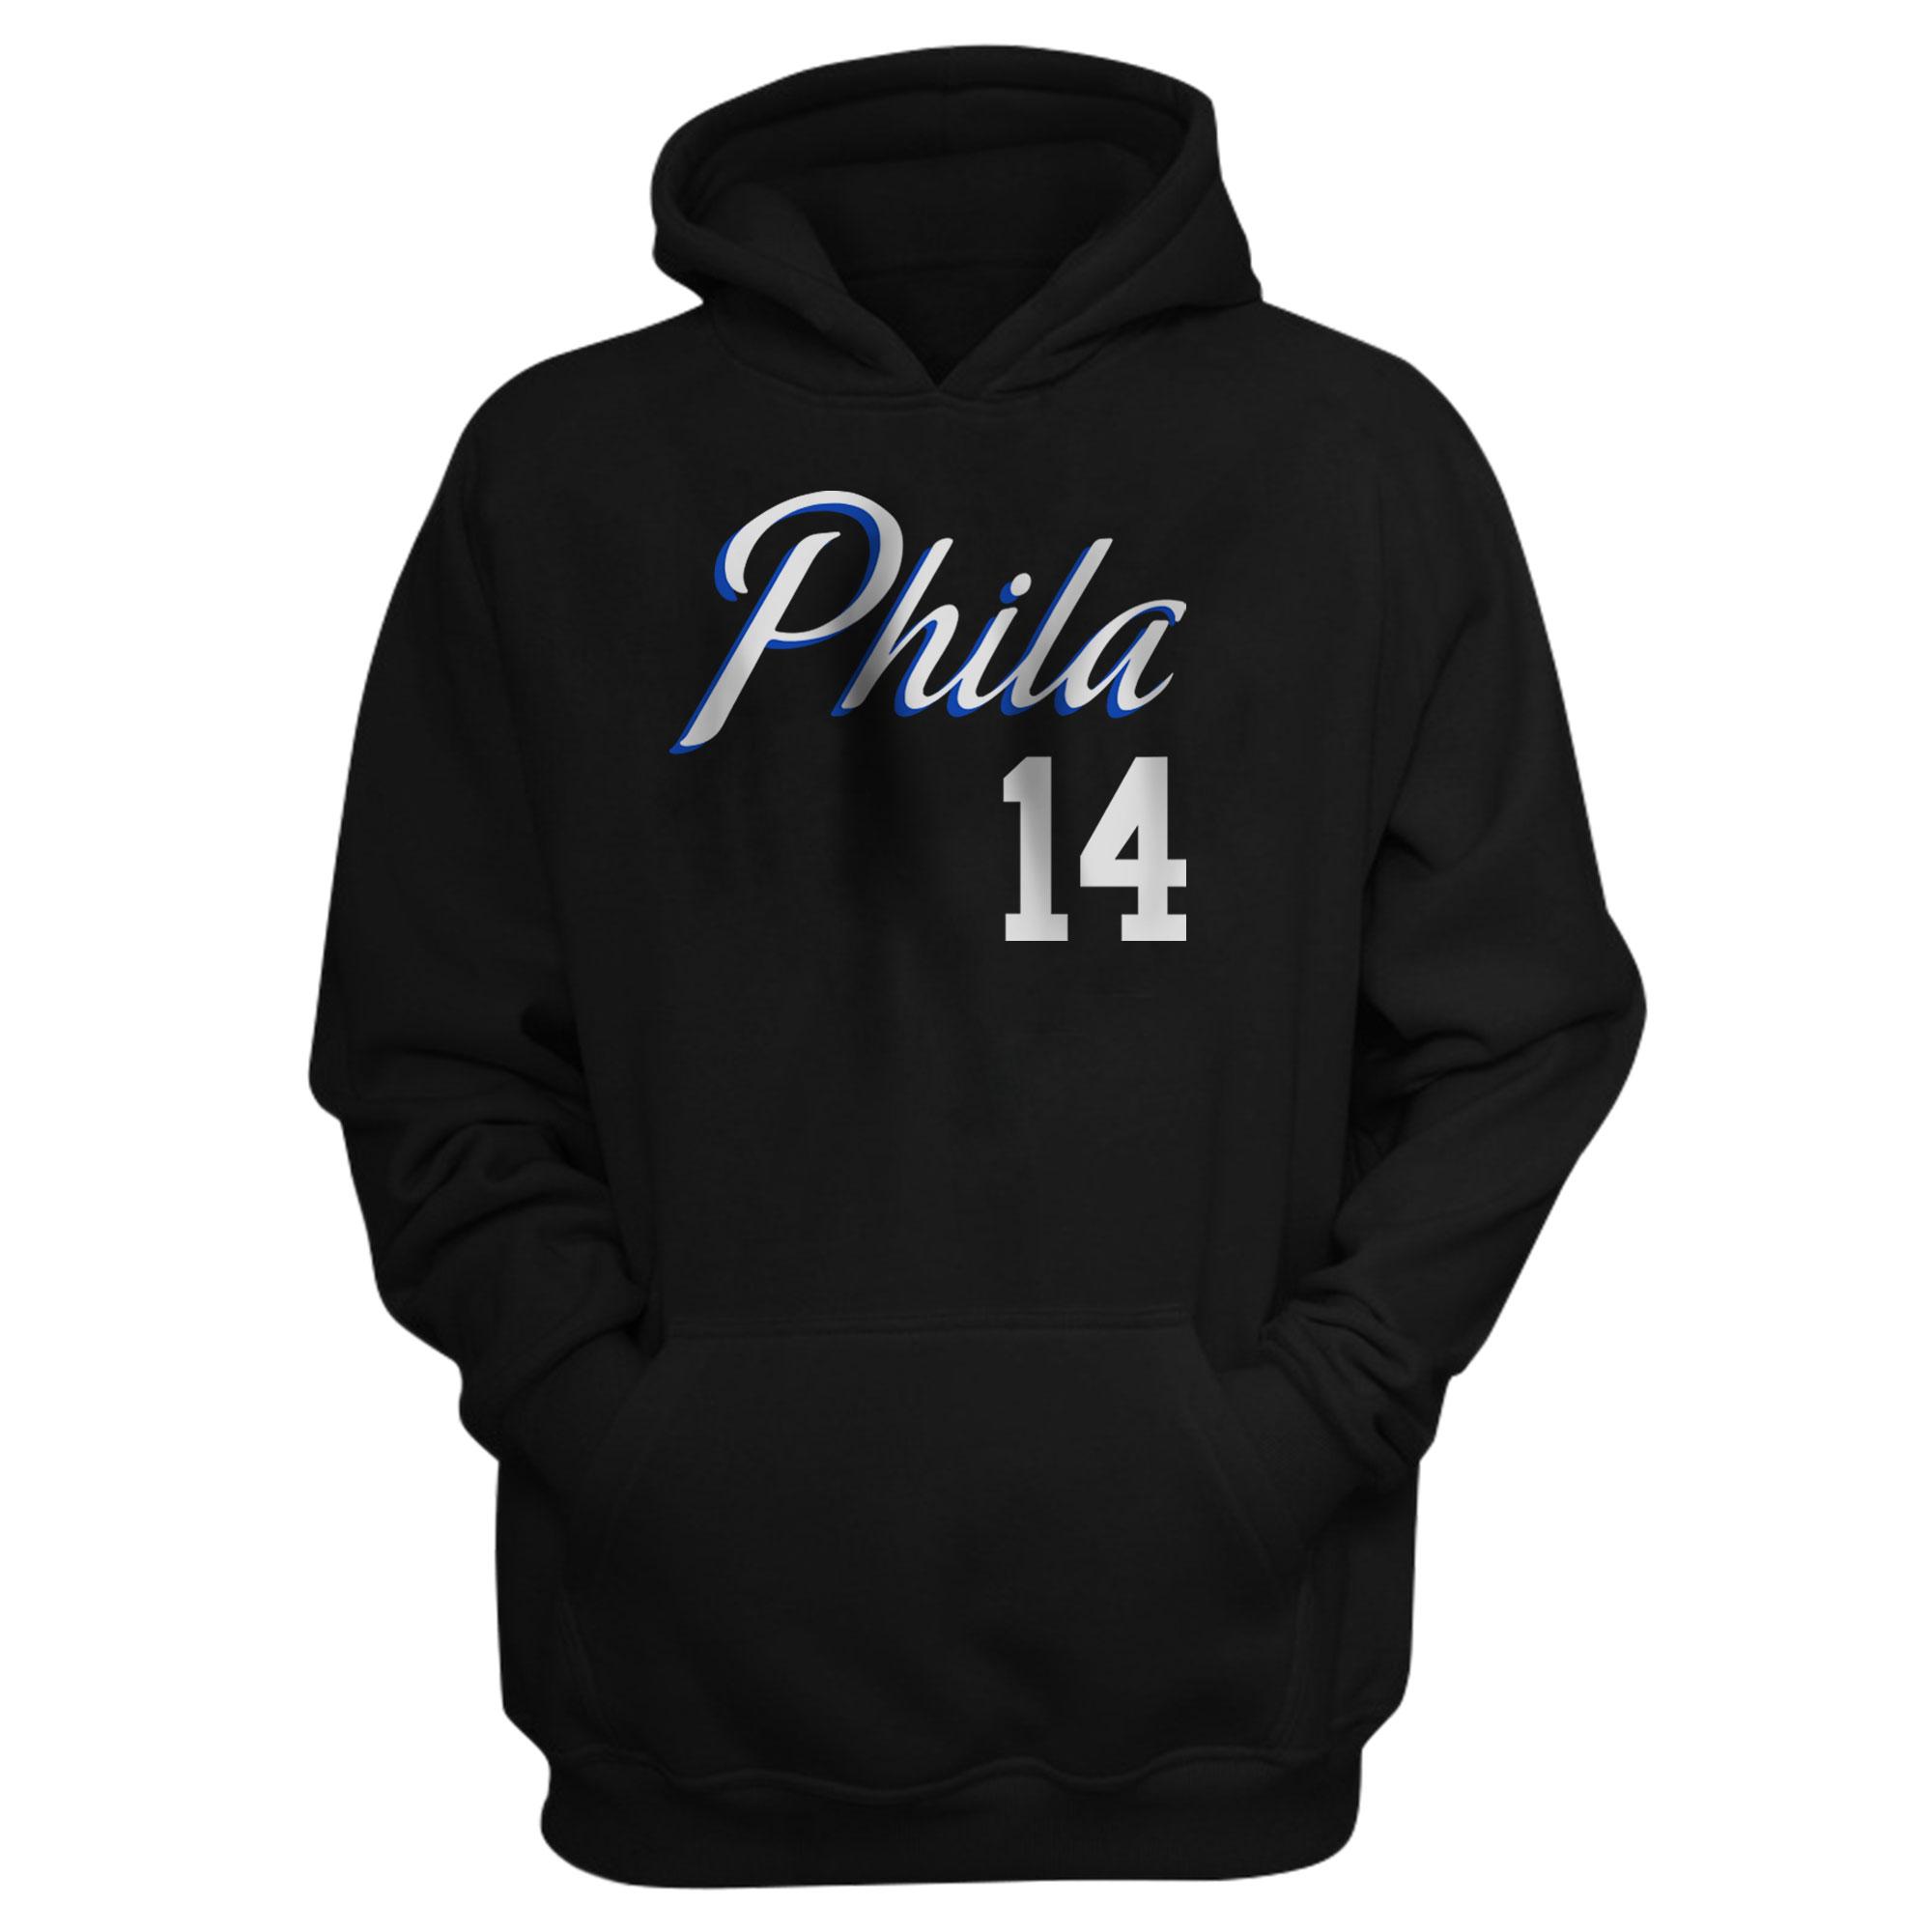 Philadelphia 76ers Danny Green Hoodie (HD-BLC-PLT-504-14)